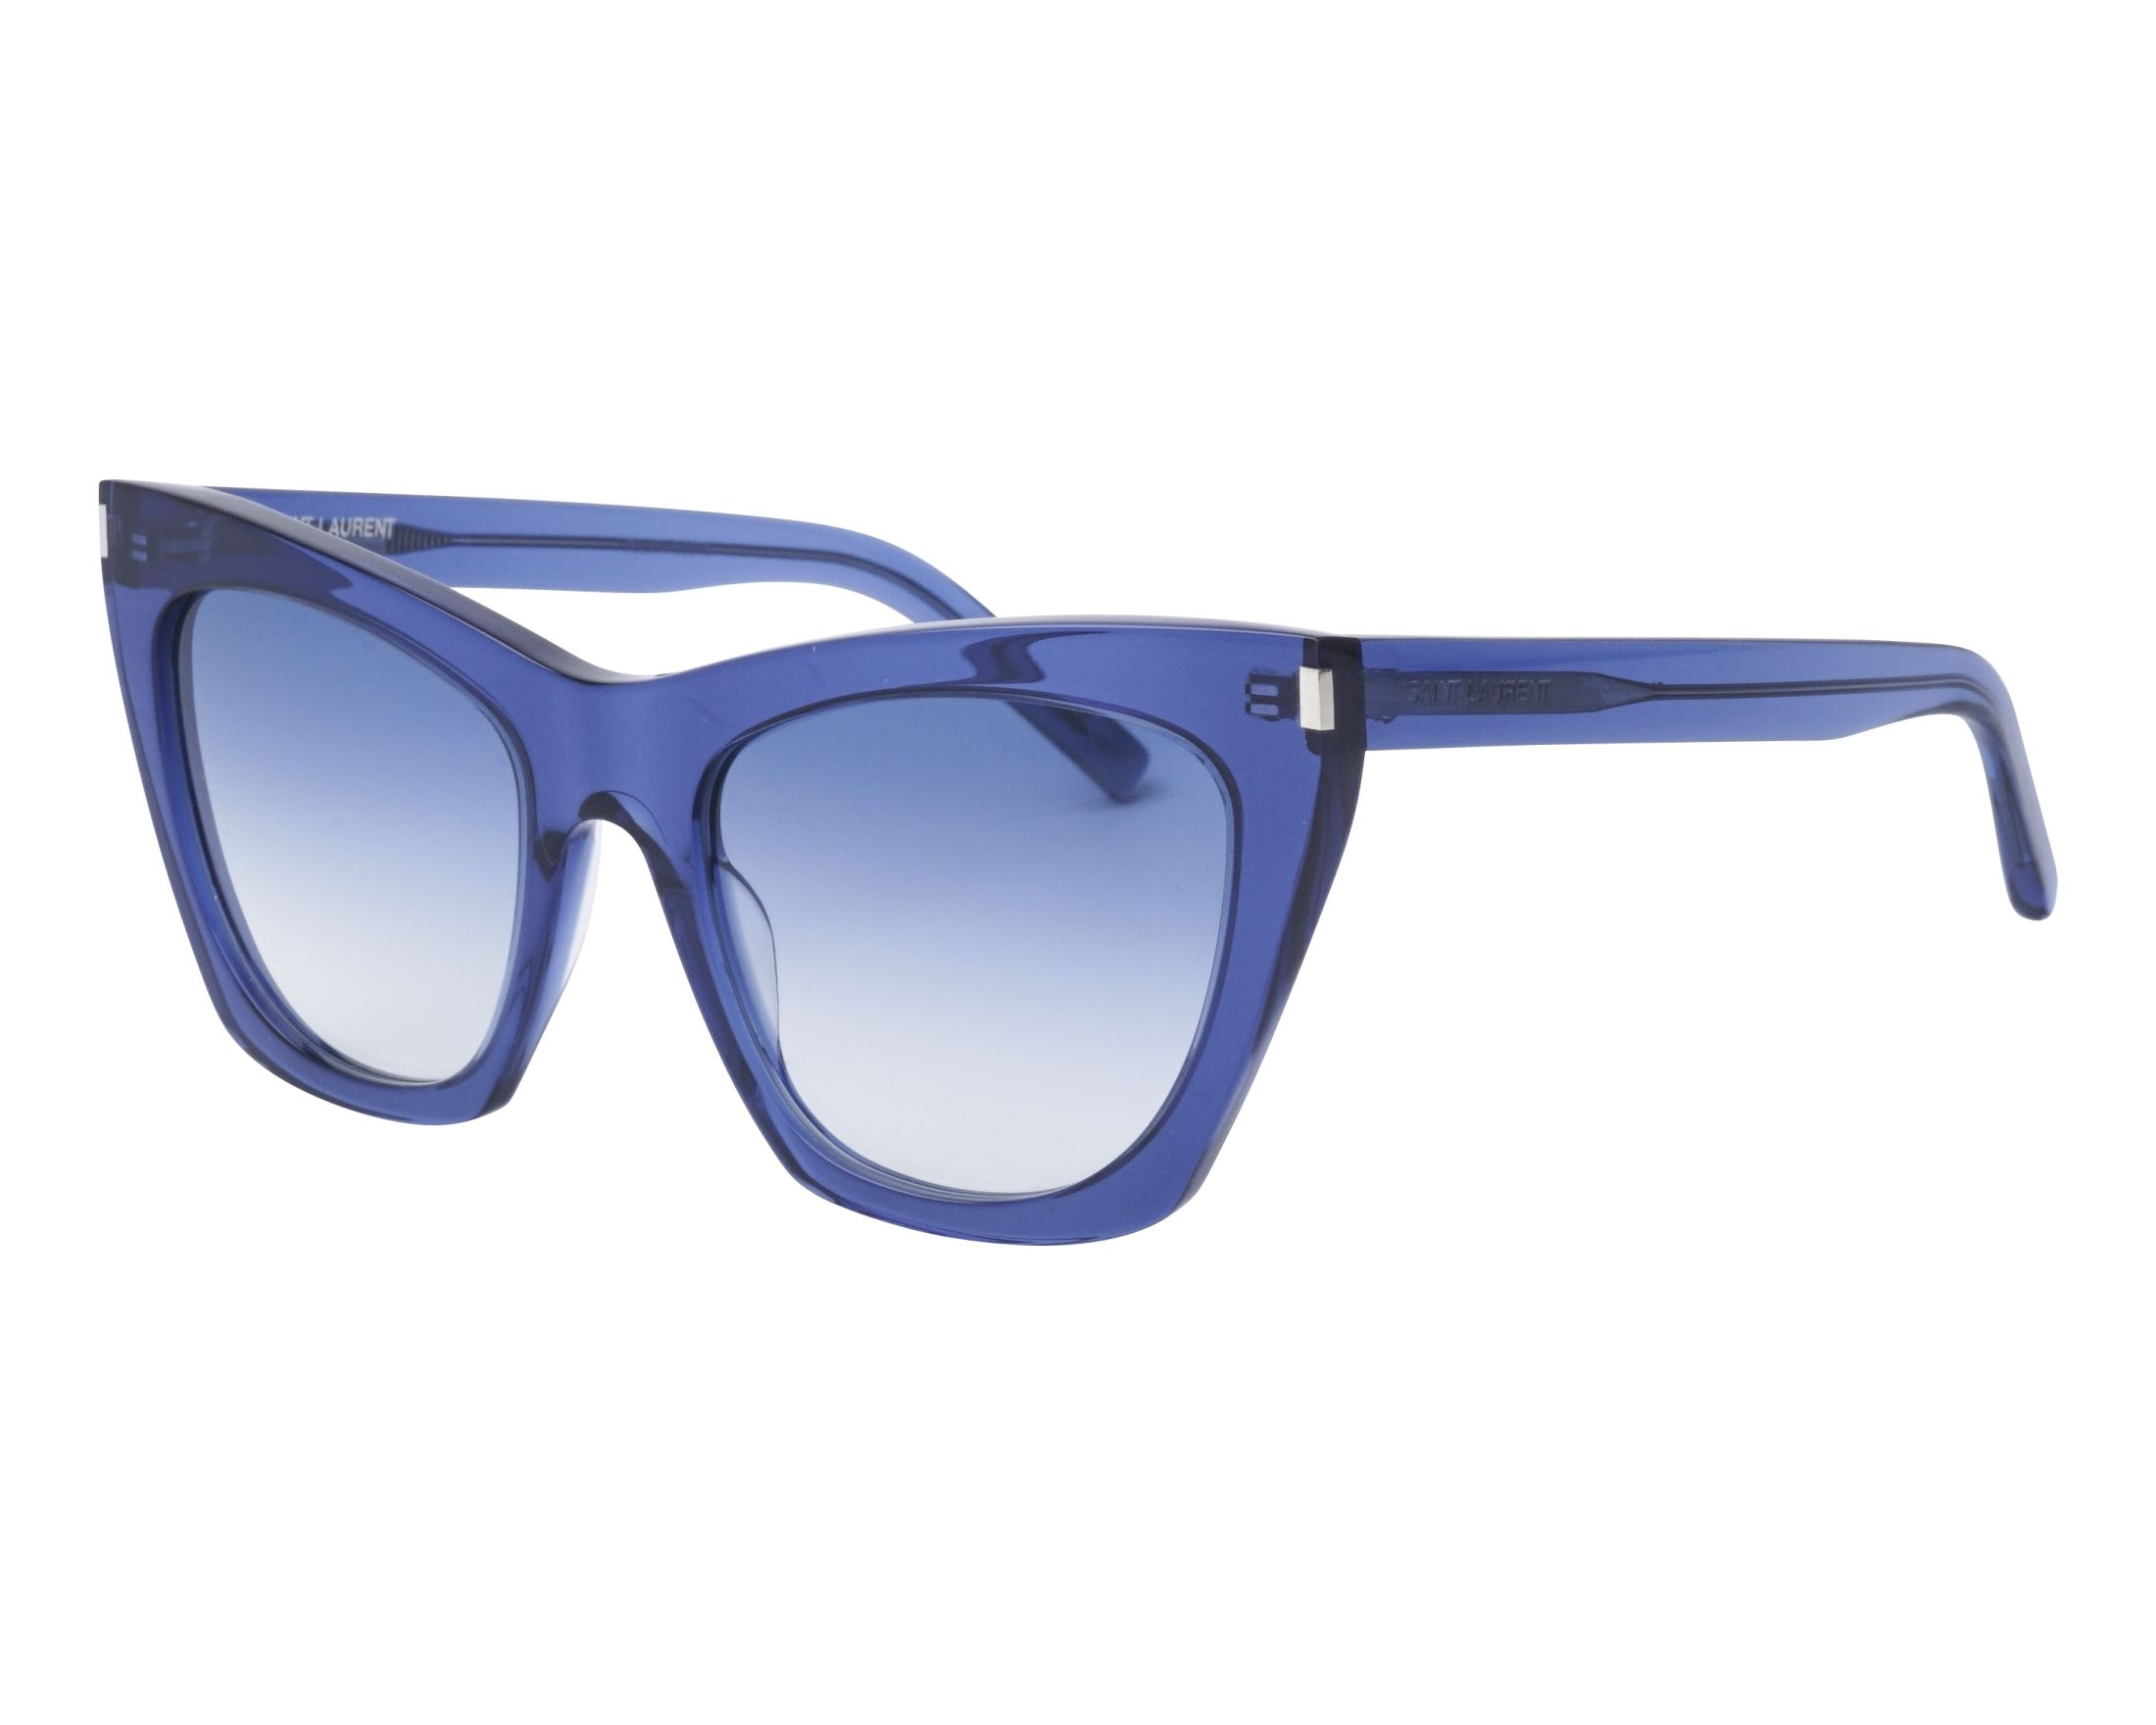 c5ae42cf366 Sunglasses Yves Saint Laurent SL-214 002 55-20 Blue profile view